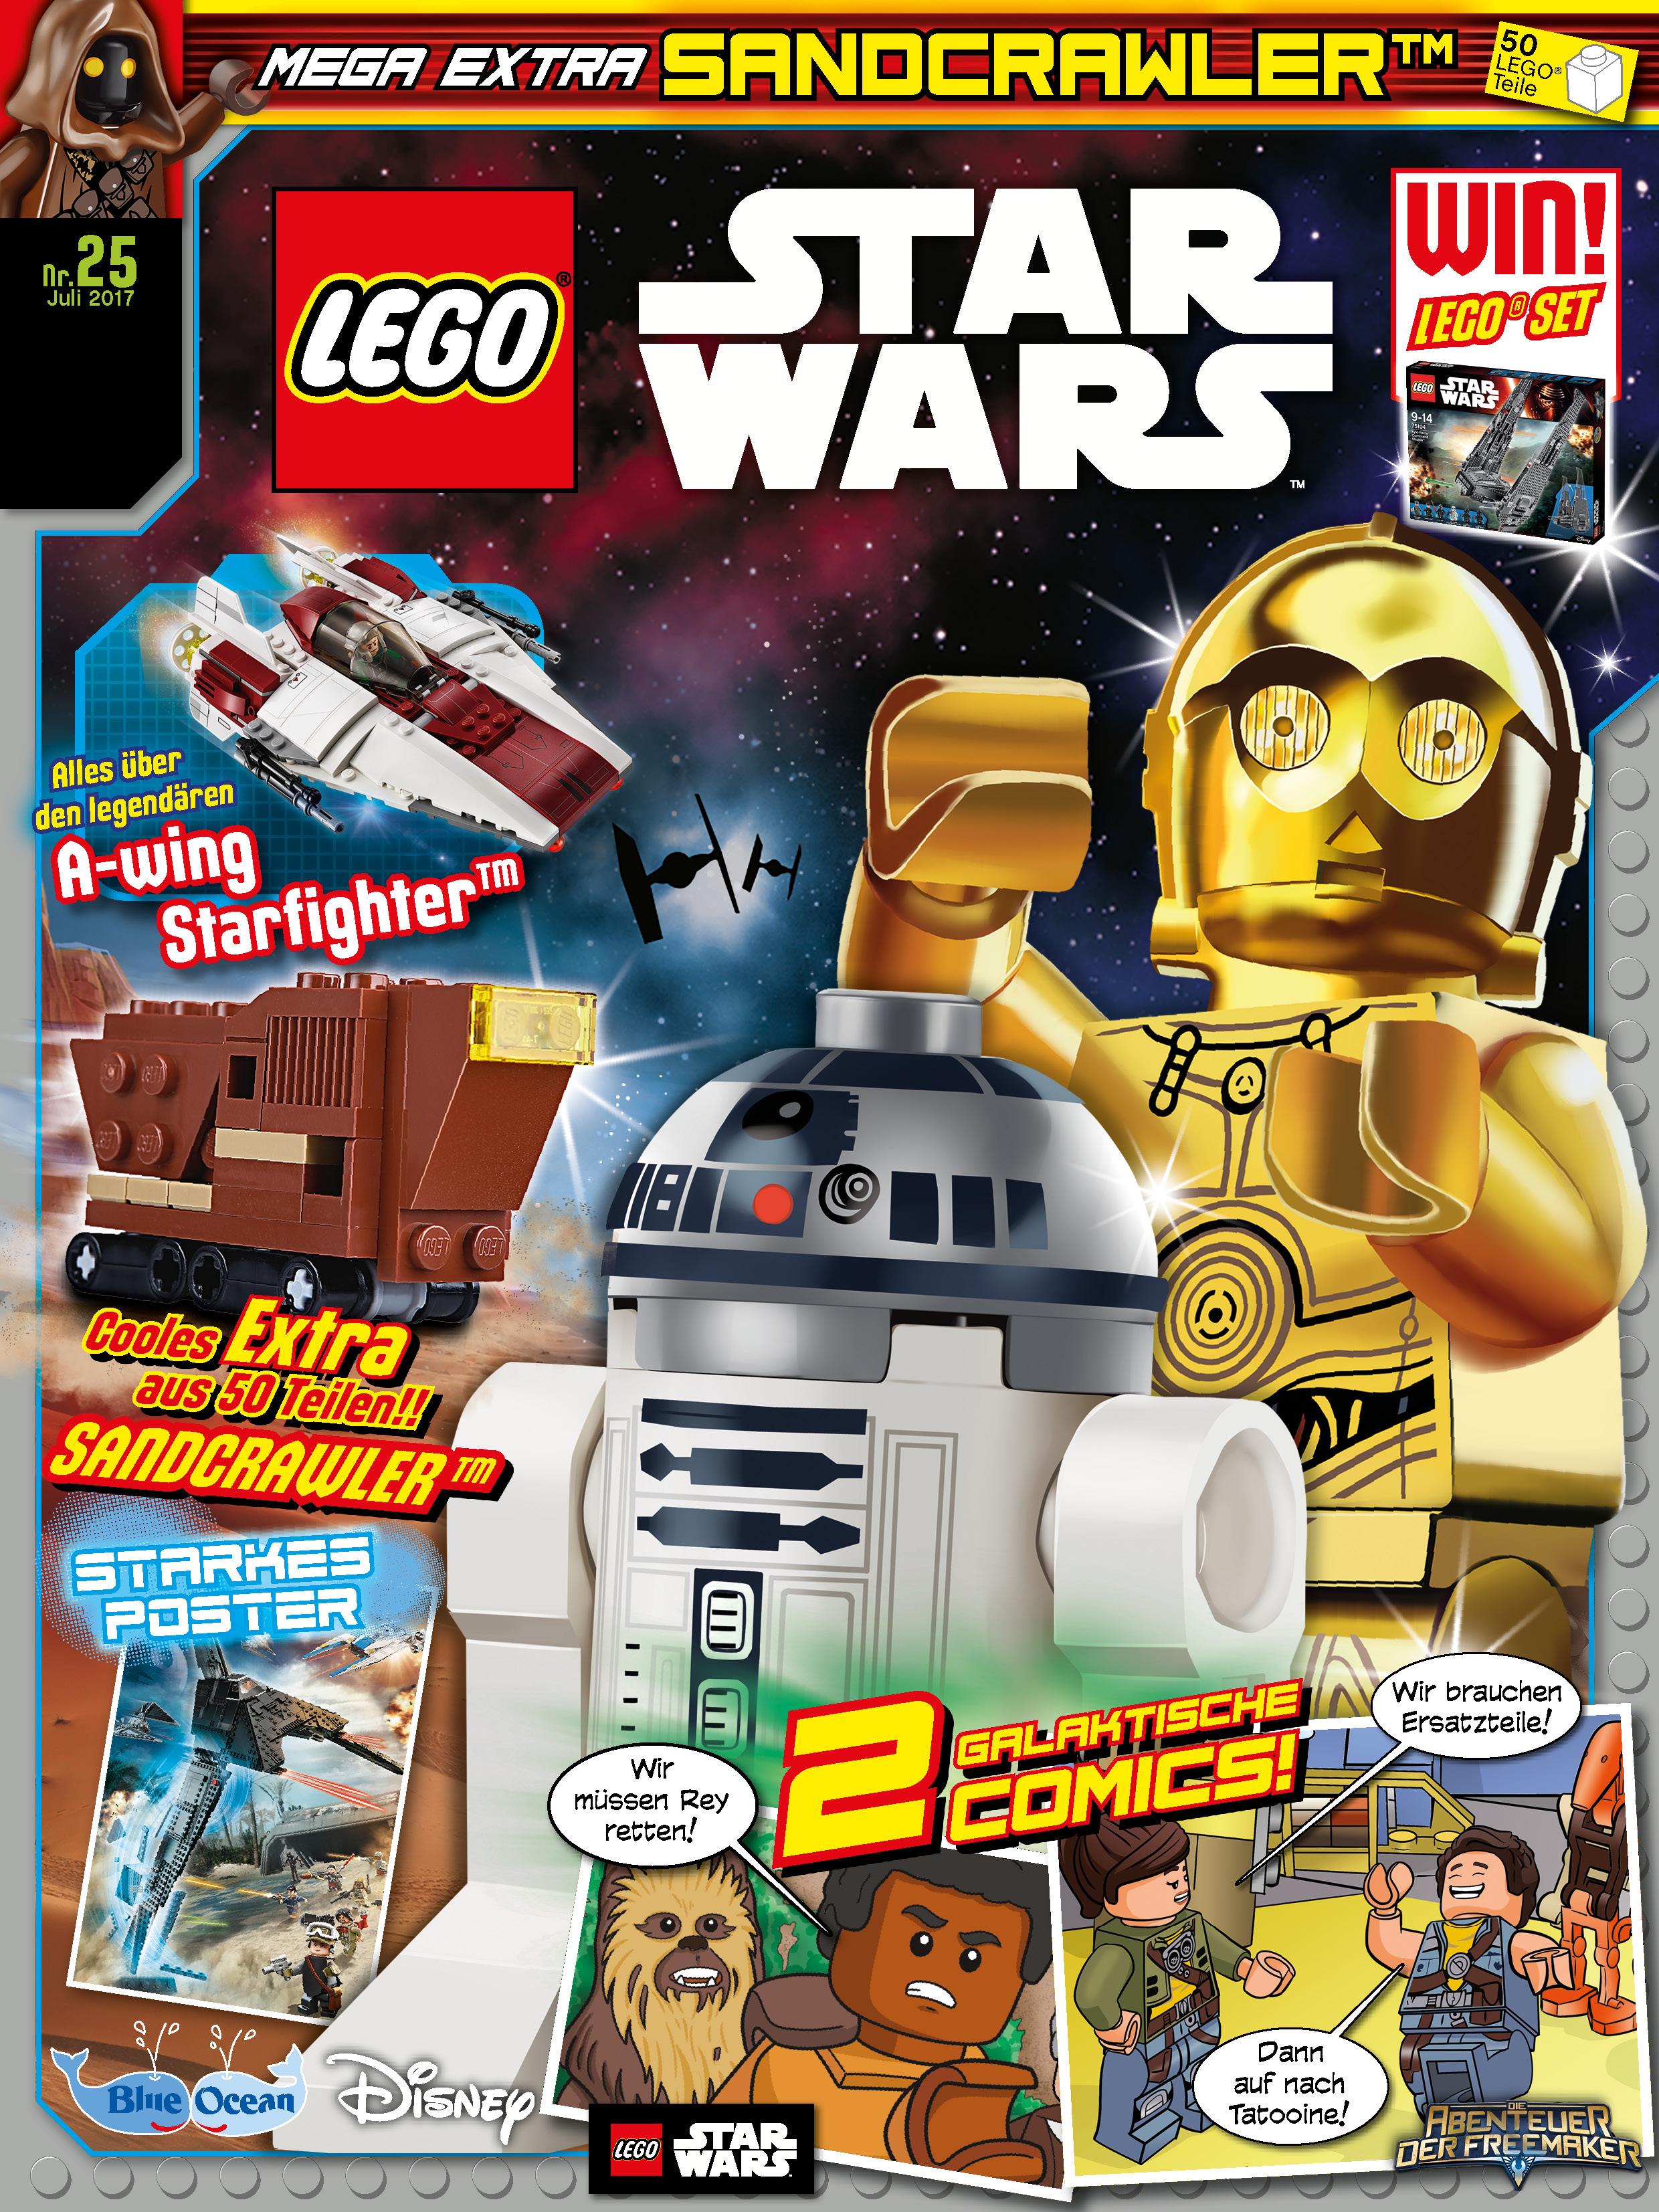 Lego Star Wars Magazine NR 25-Sandcrawler-NEW #11H5